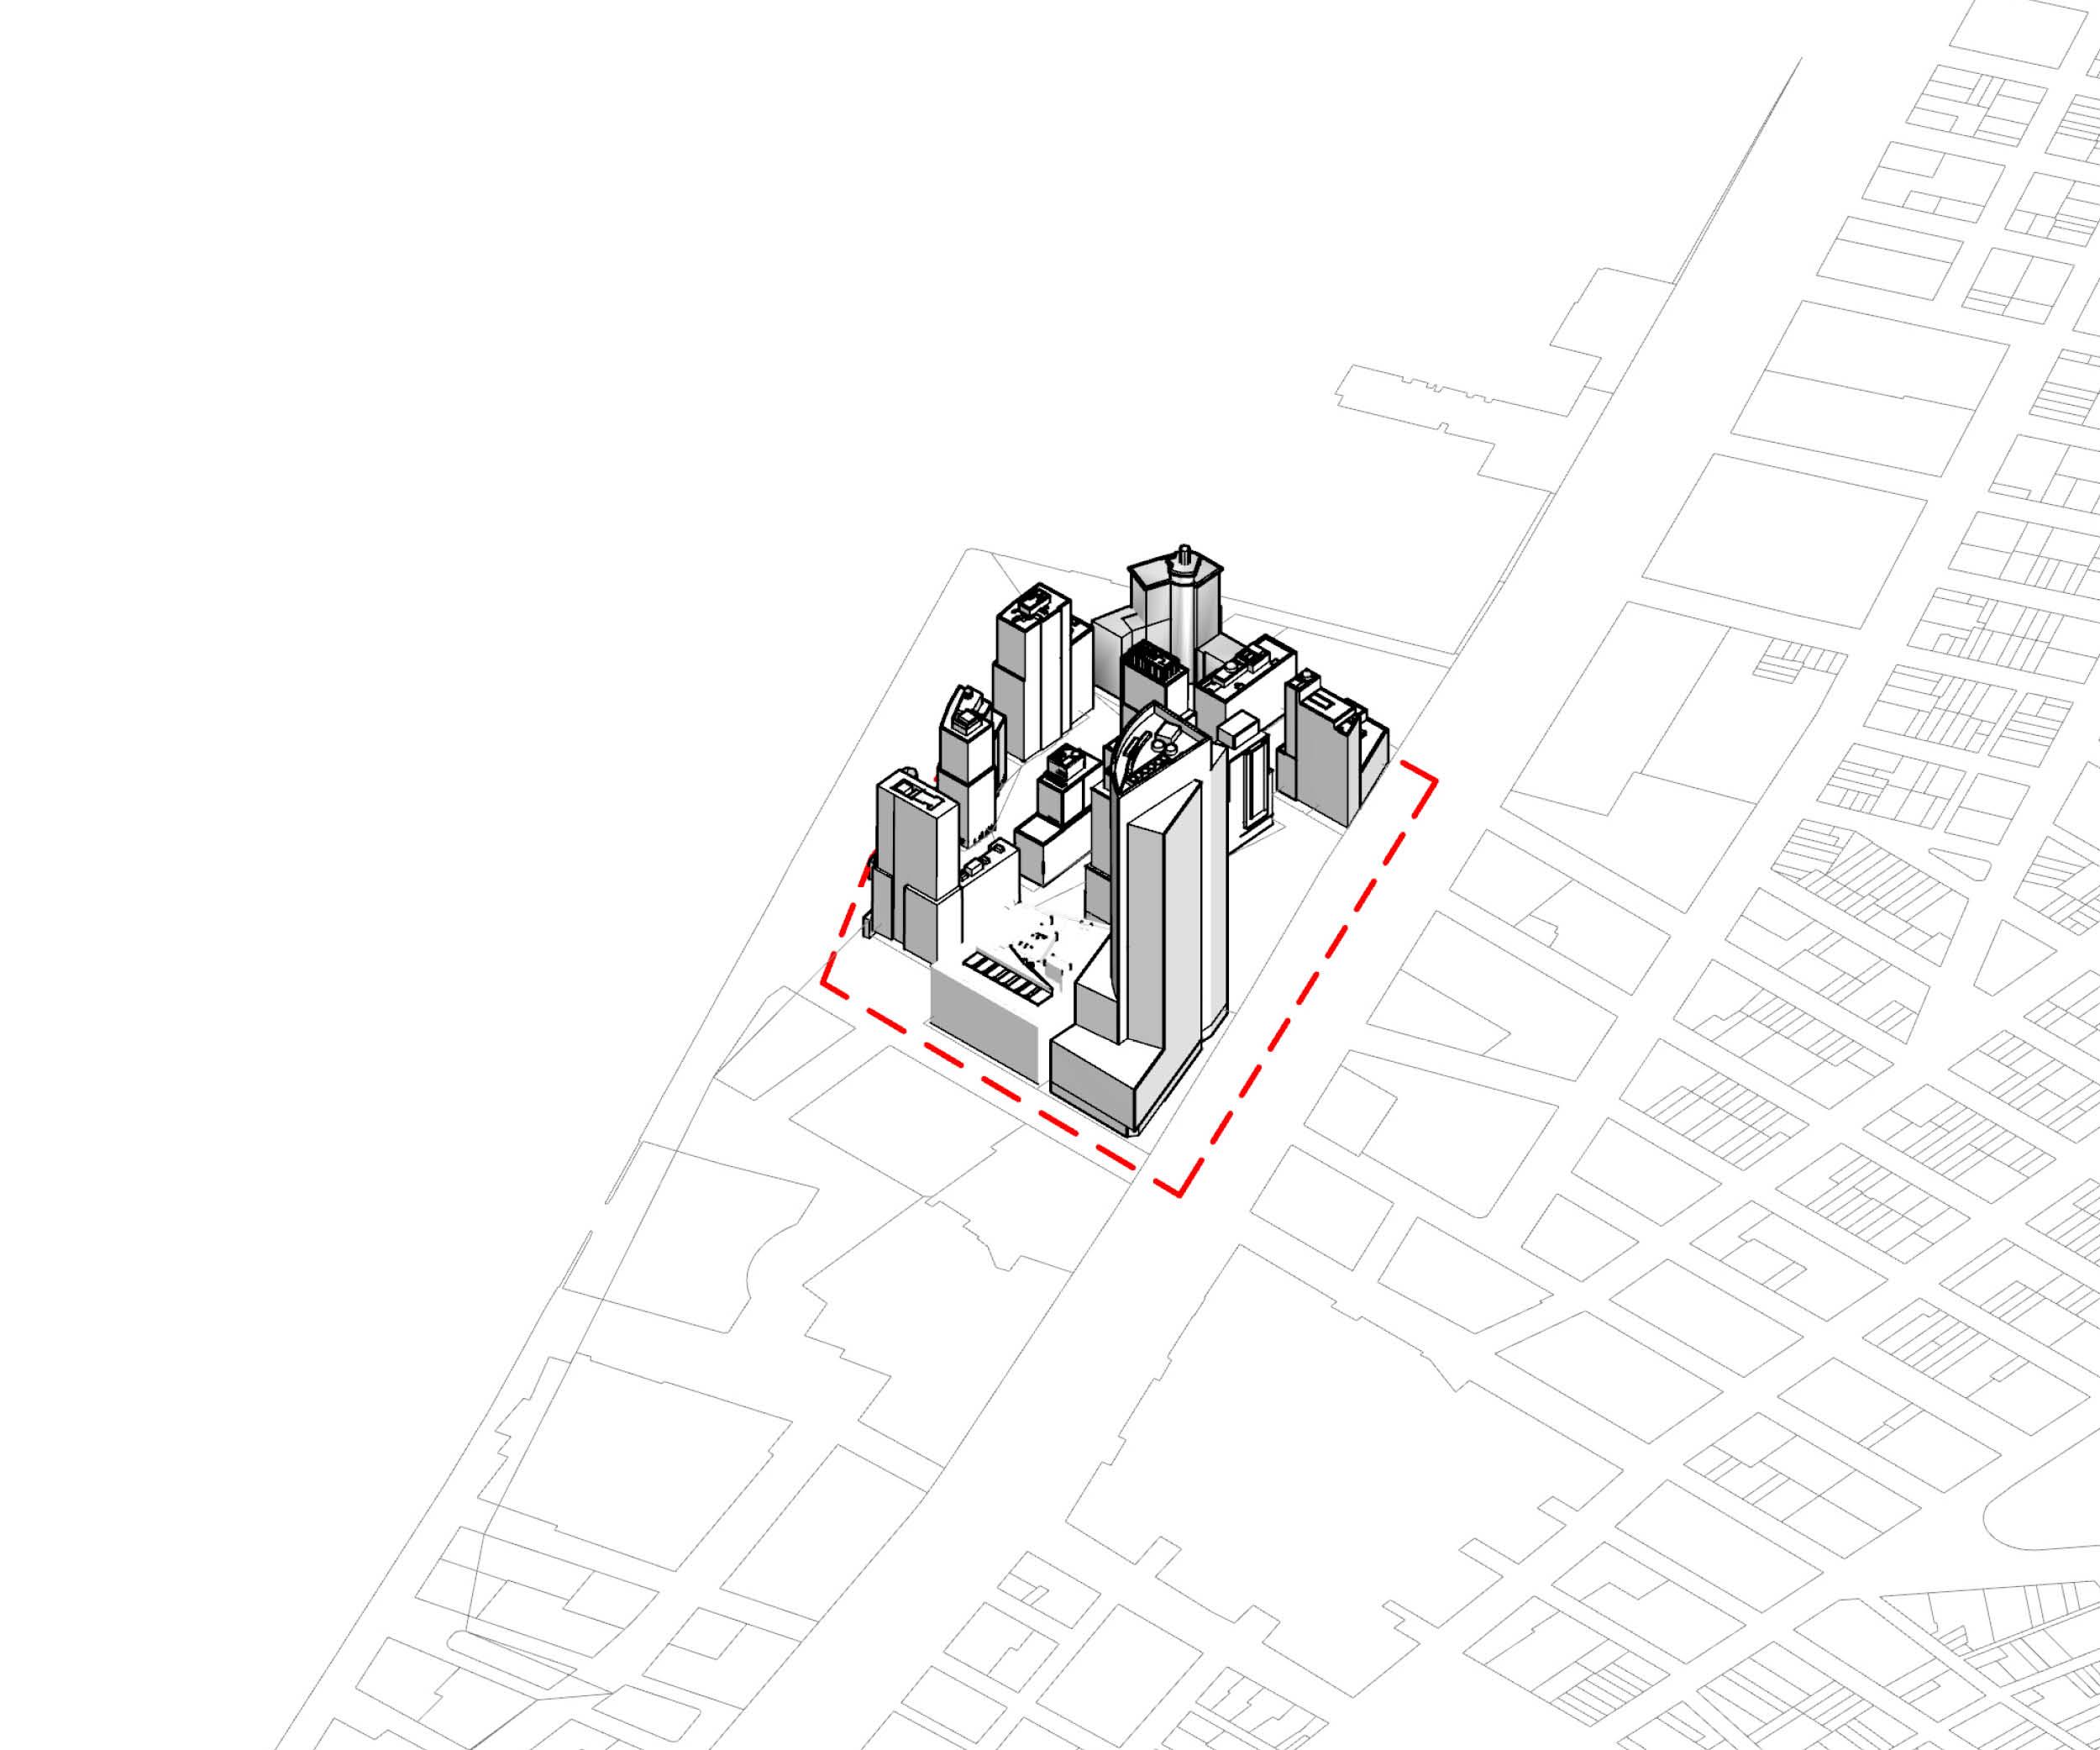 Battery Park City North   LD FAR: 5.2  NYC FAR: 15.7